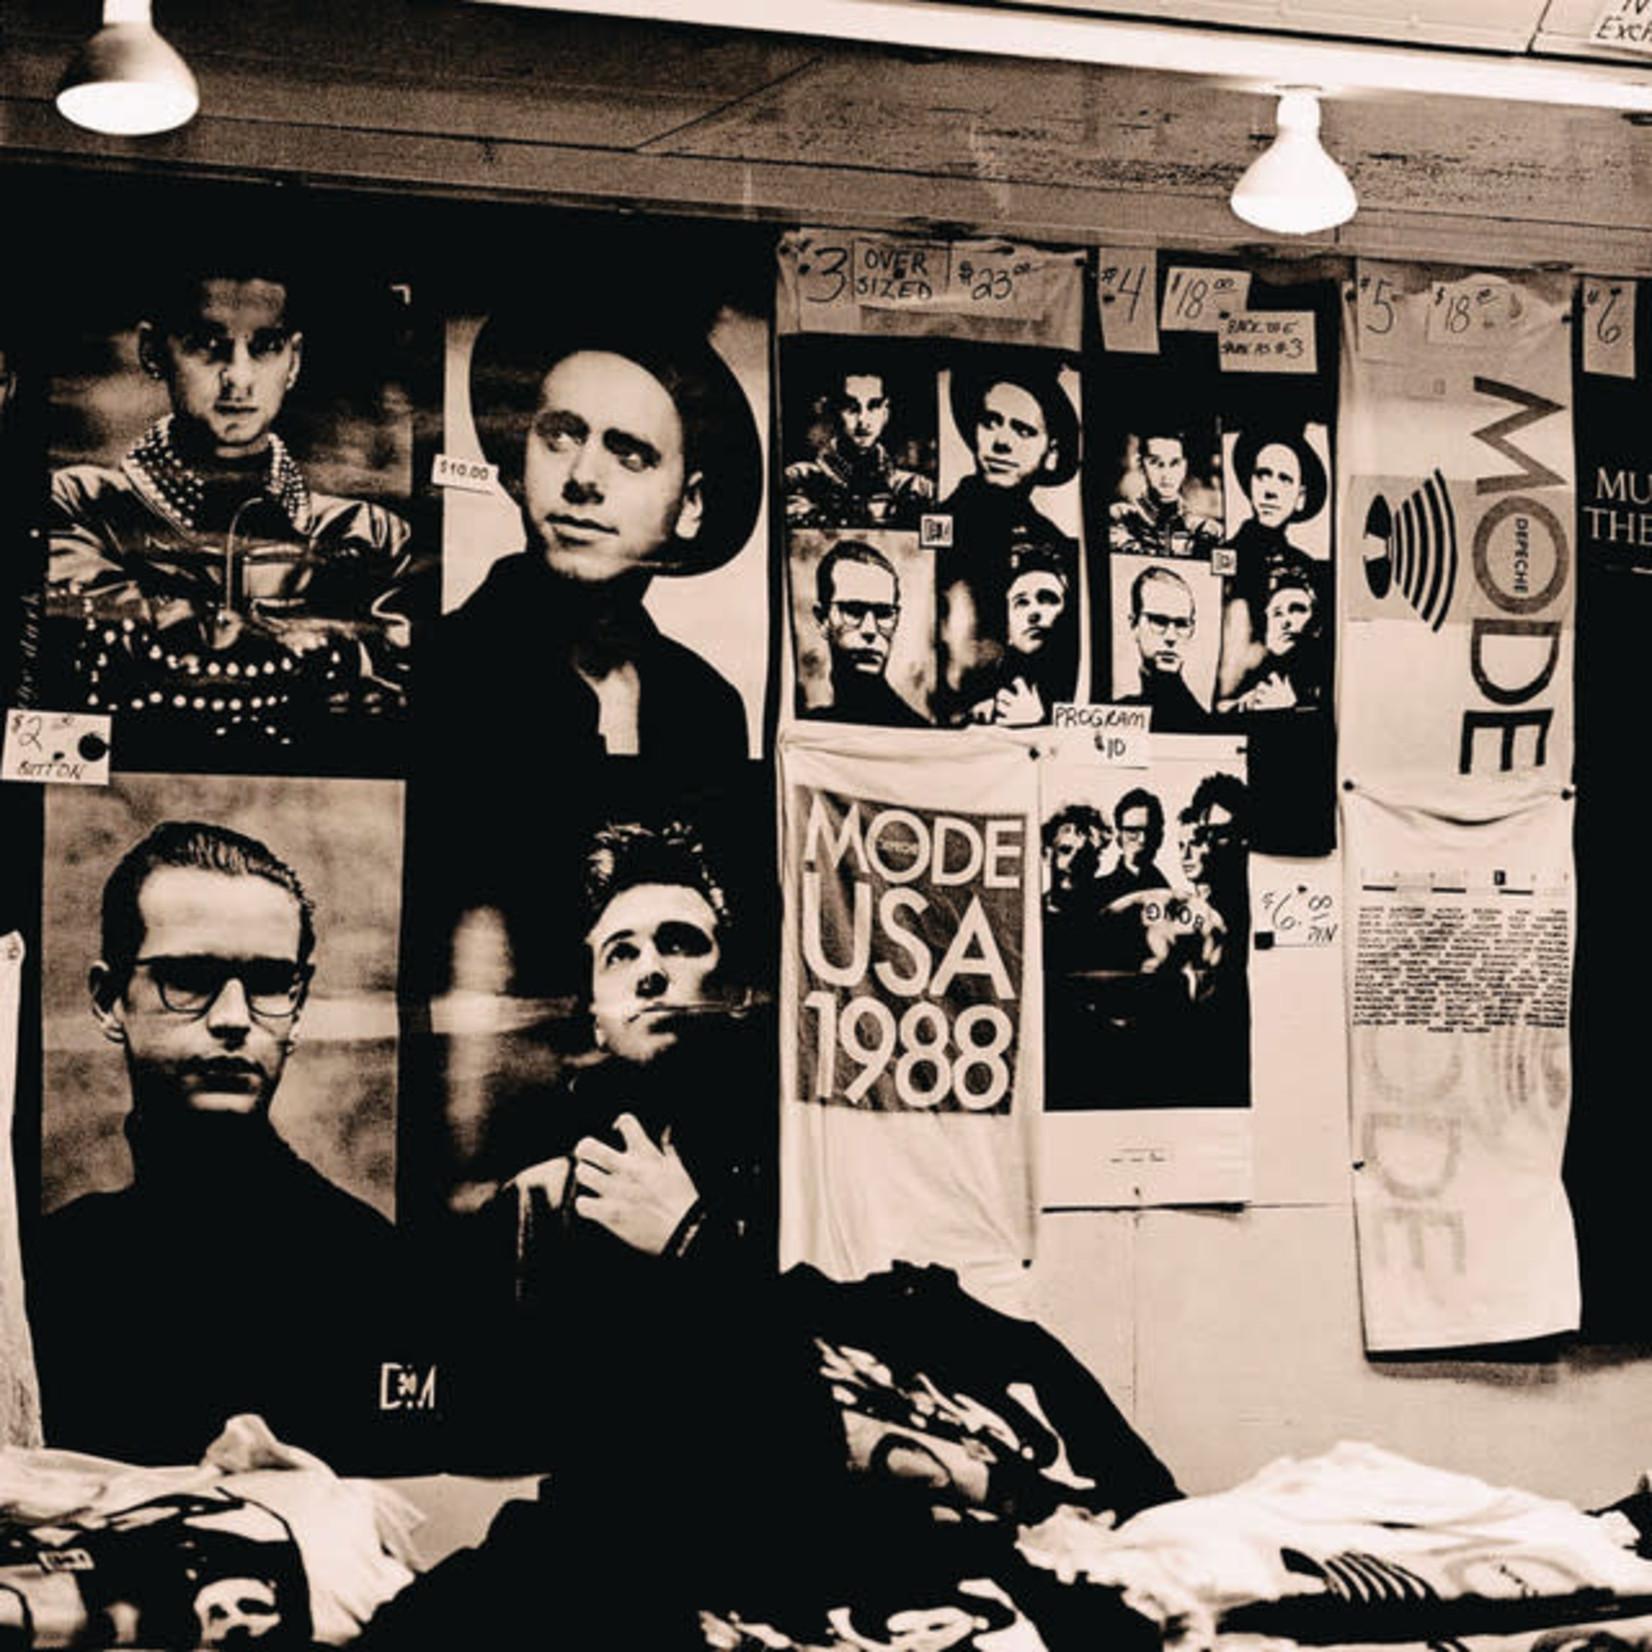 Vinyl Depeche Mode - 101